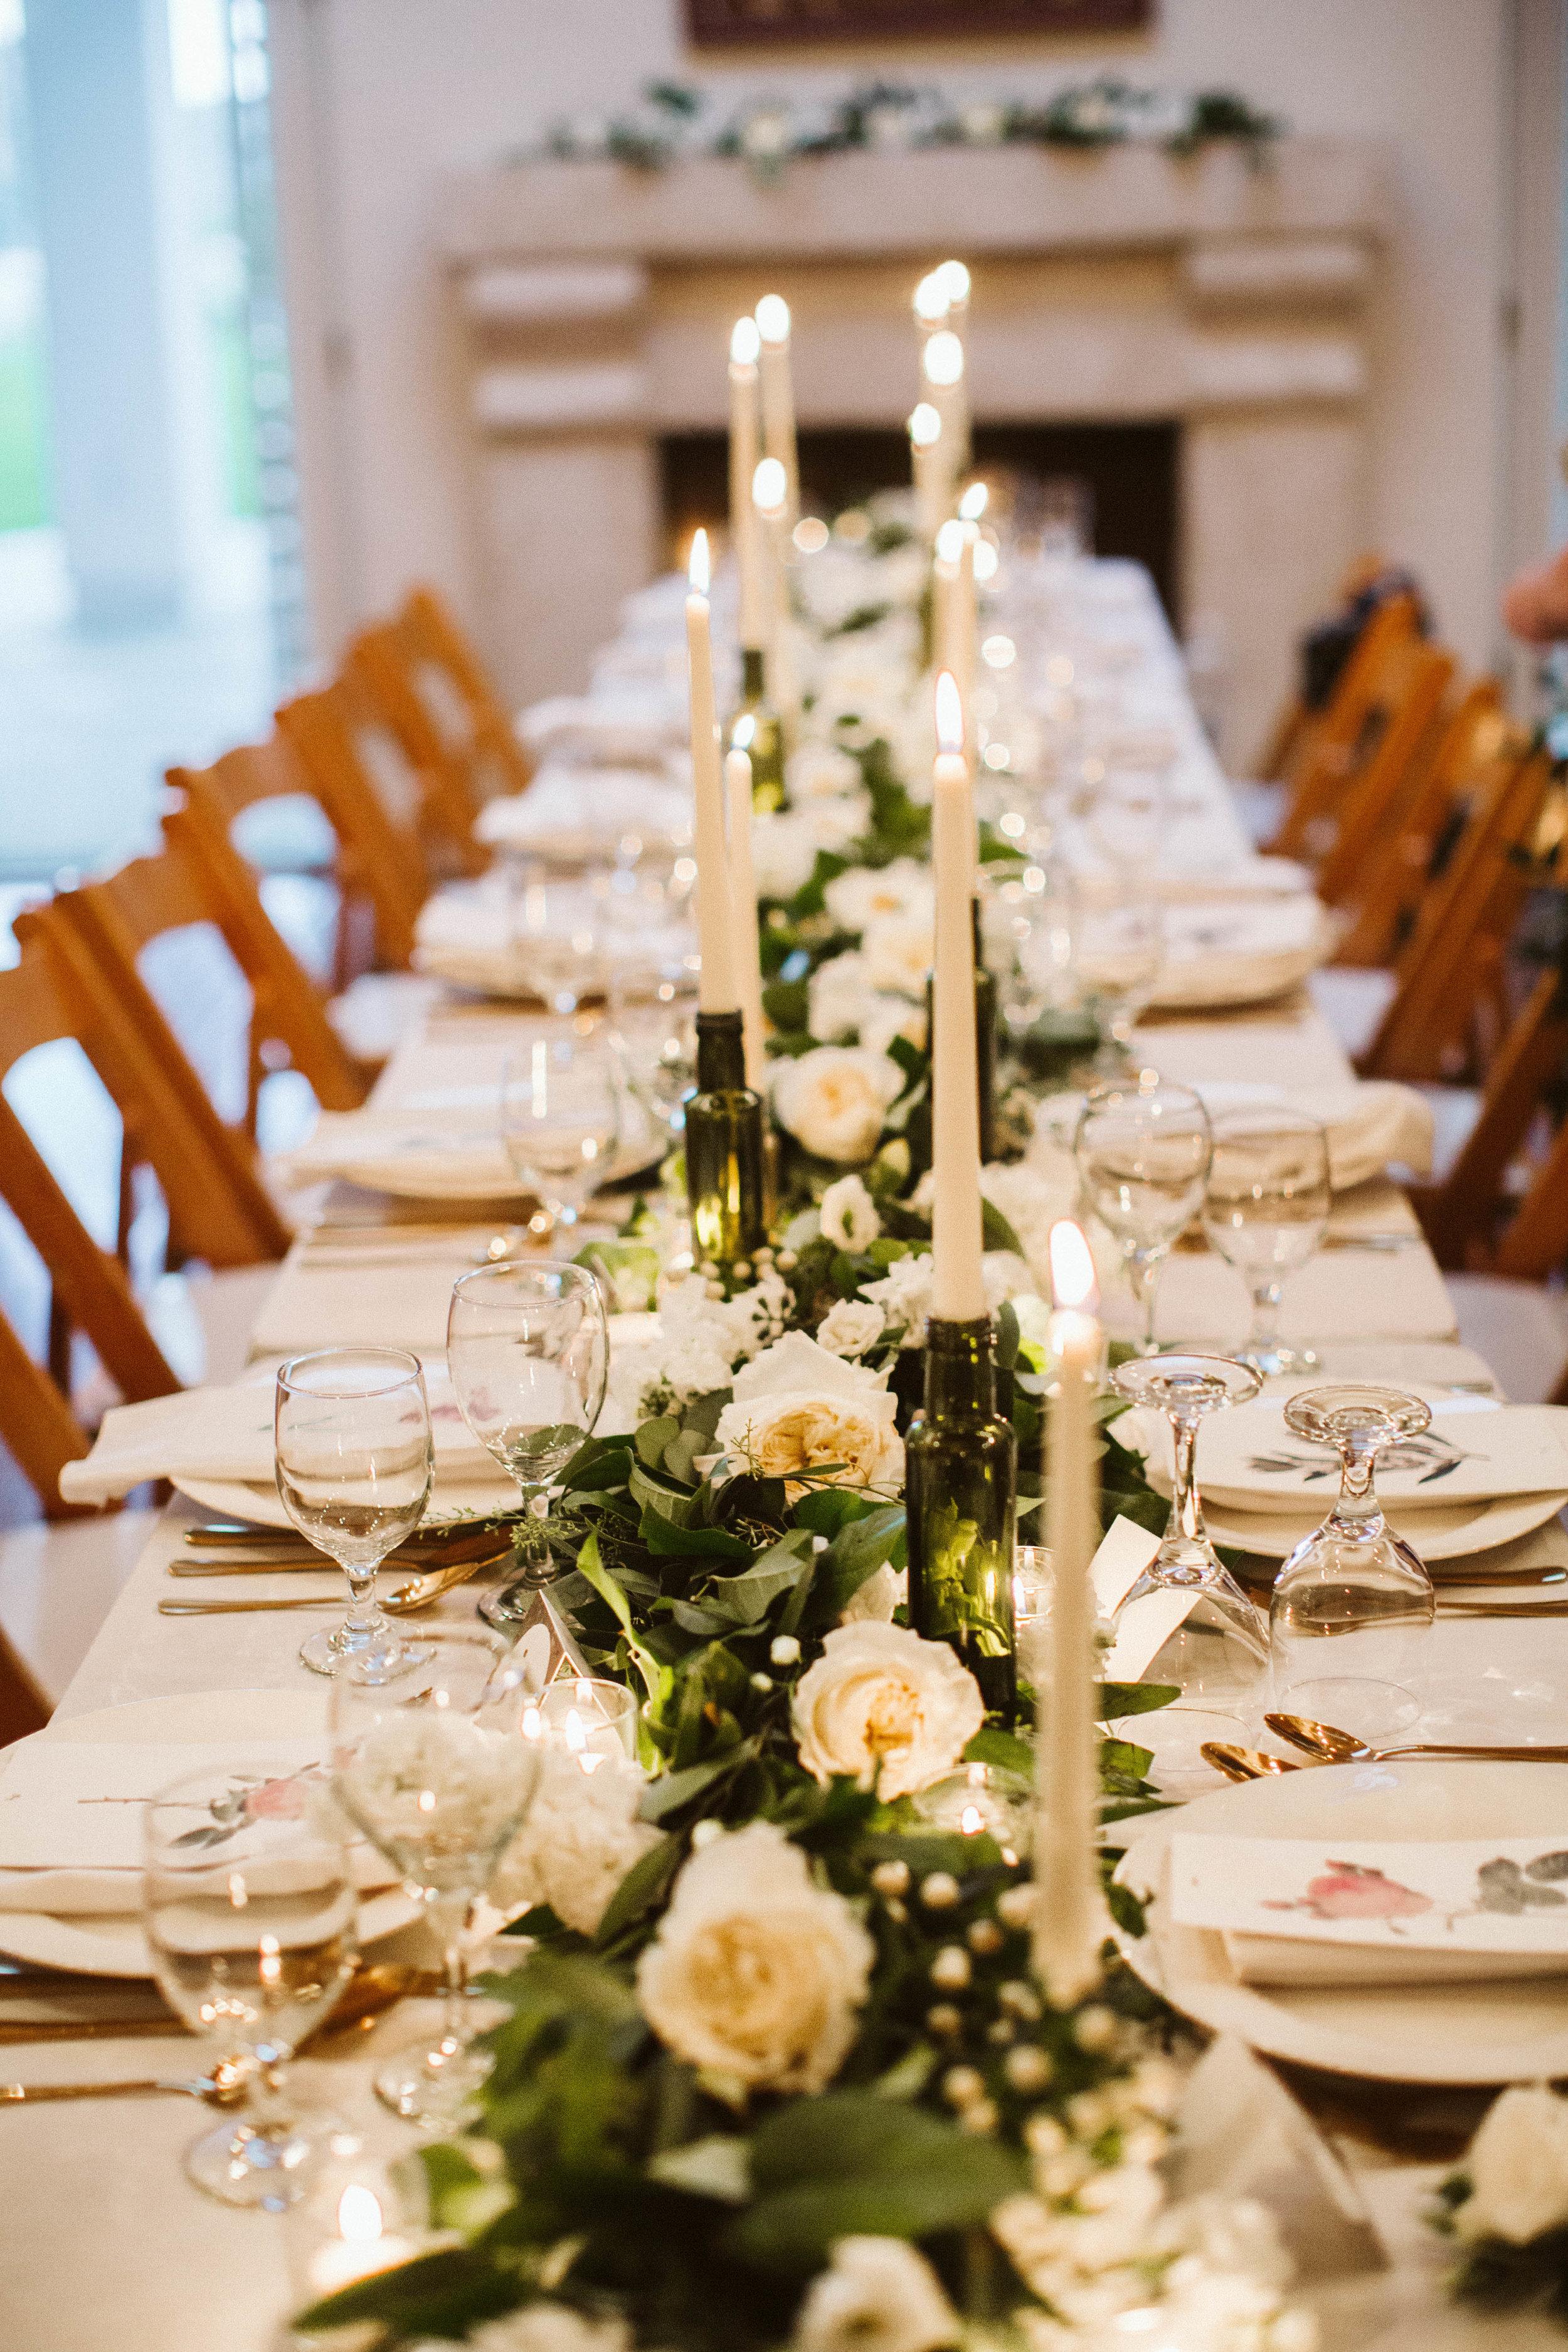 Tessa & Xavier's wedding dinner- Photo: Jessica Caballero Photo